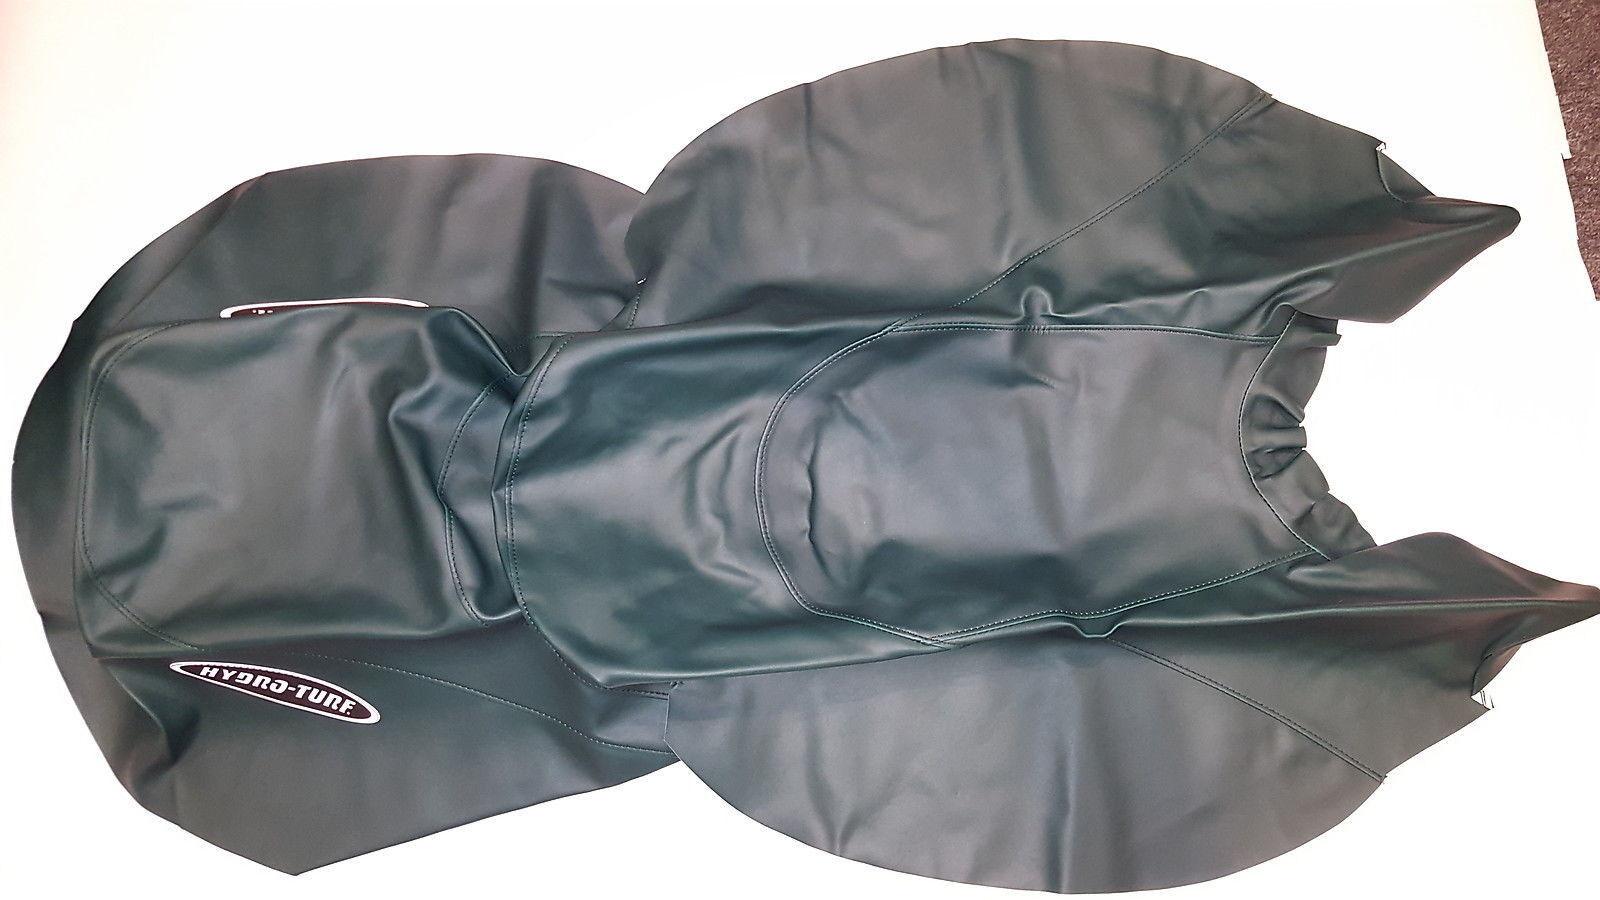 Hydro-Turf GTX auf Lager - Sitzbezug - Seadoo GTX Hydro-Turf (00-02) - Dunkelgrün 0ff080